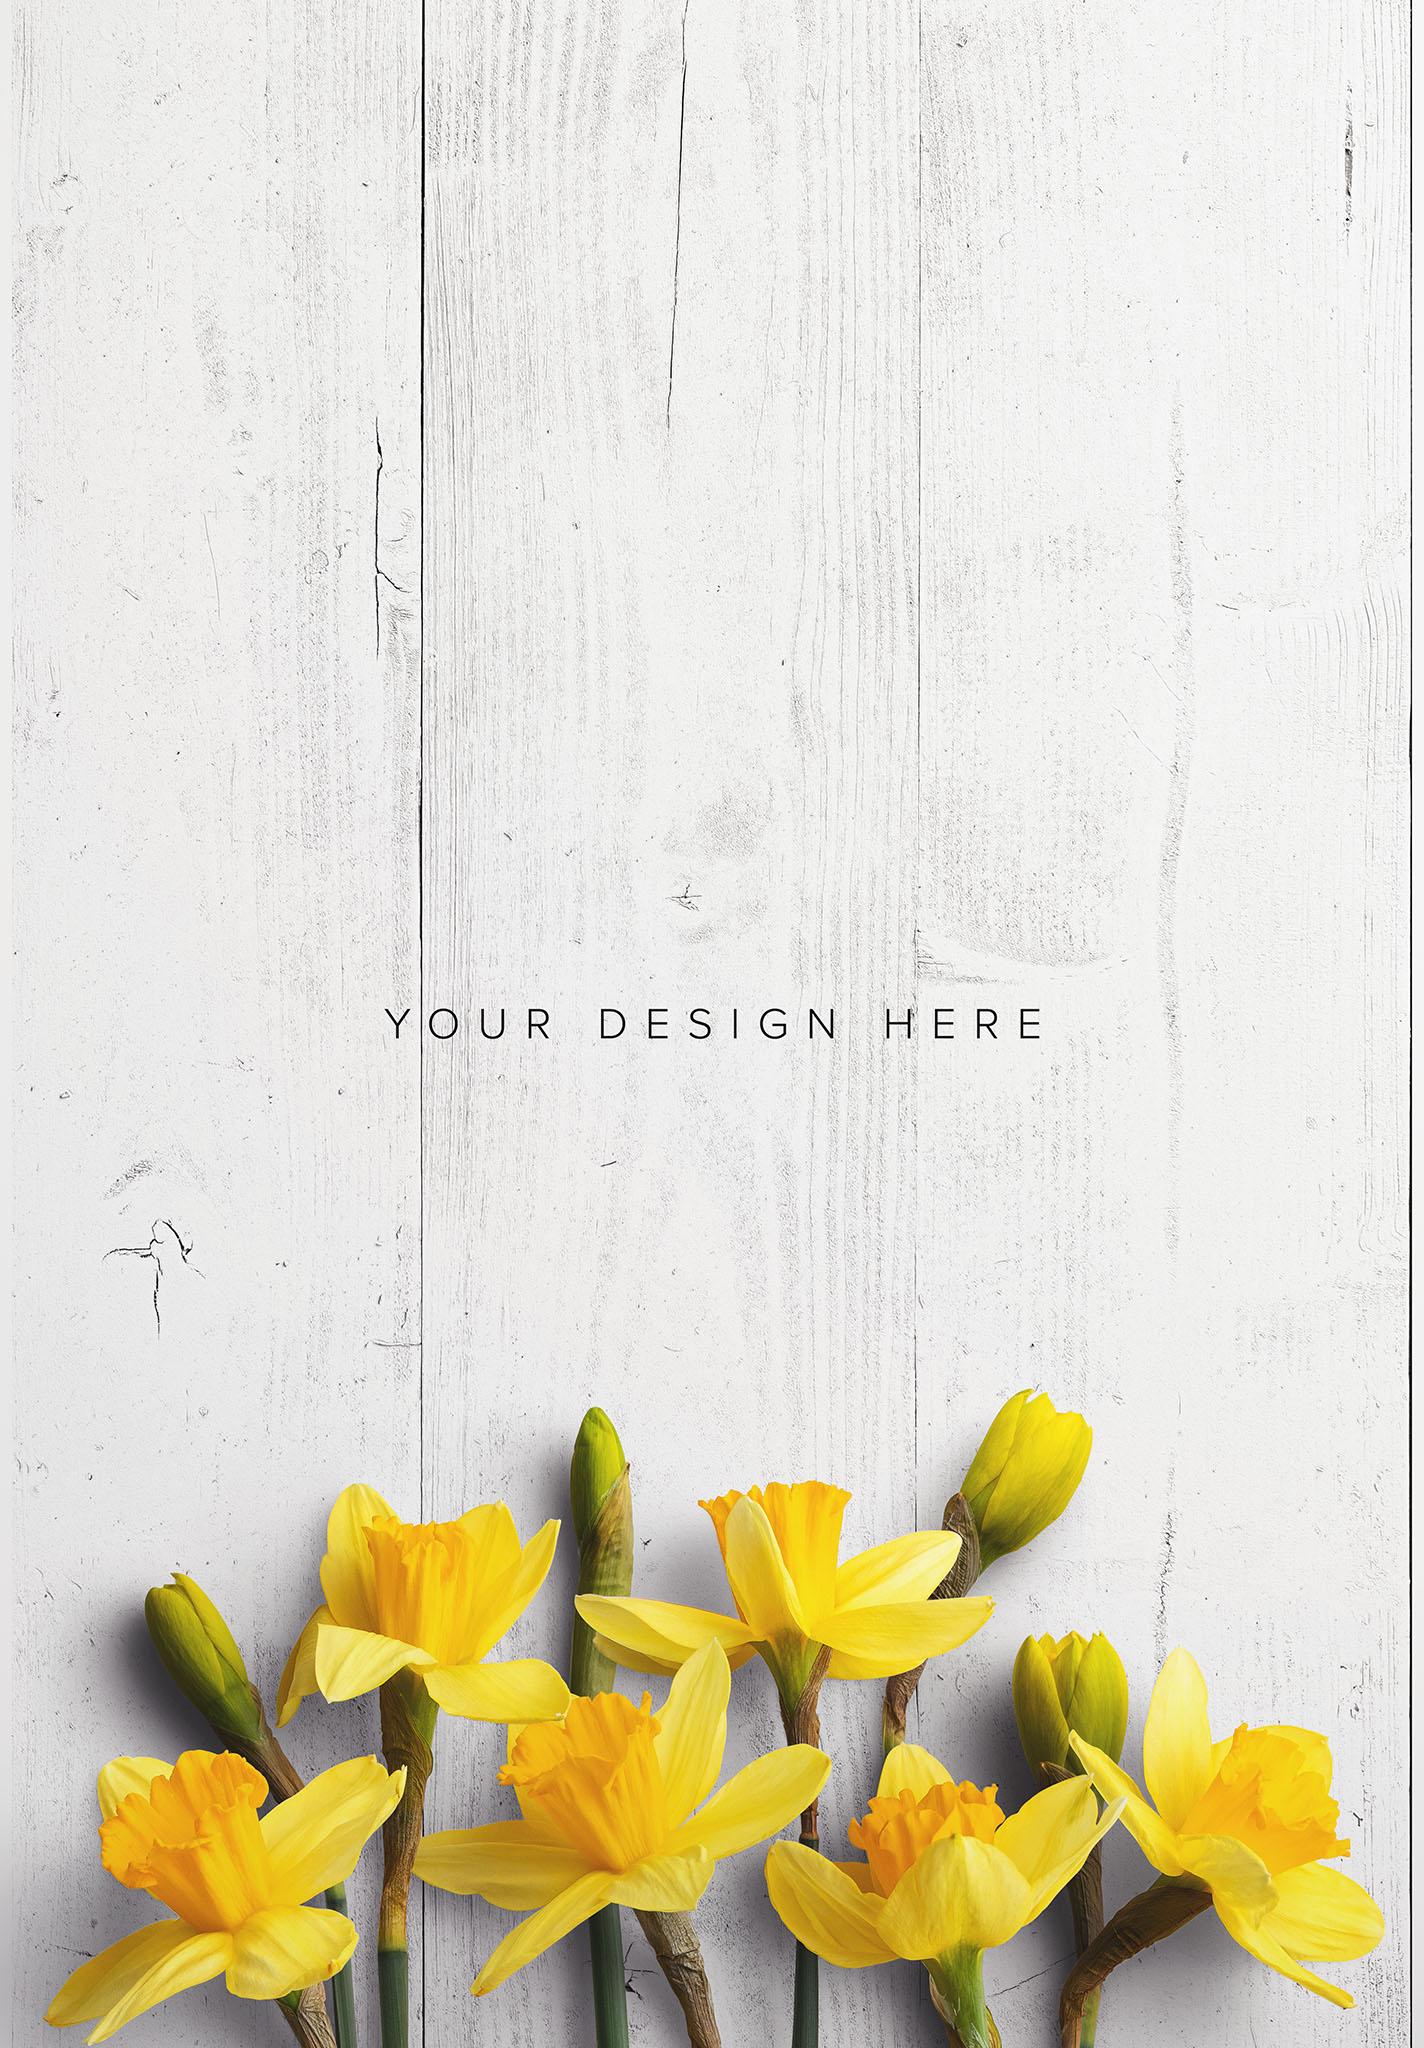 Daffodils Custom Scene Creator Template 6 Thumbnail